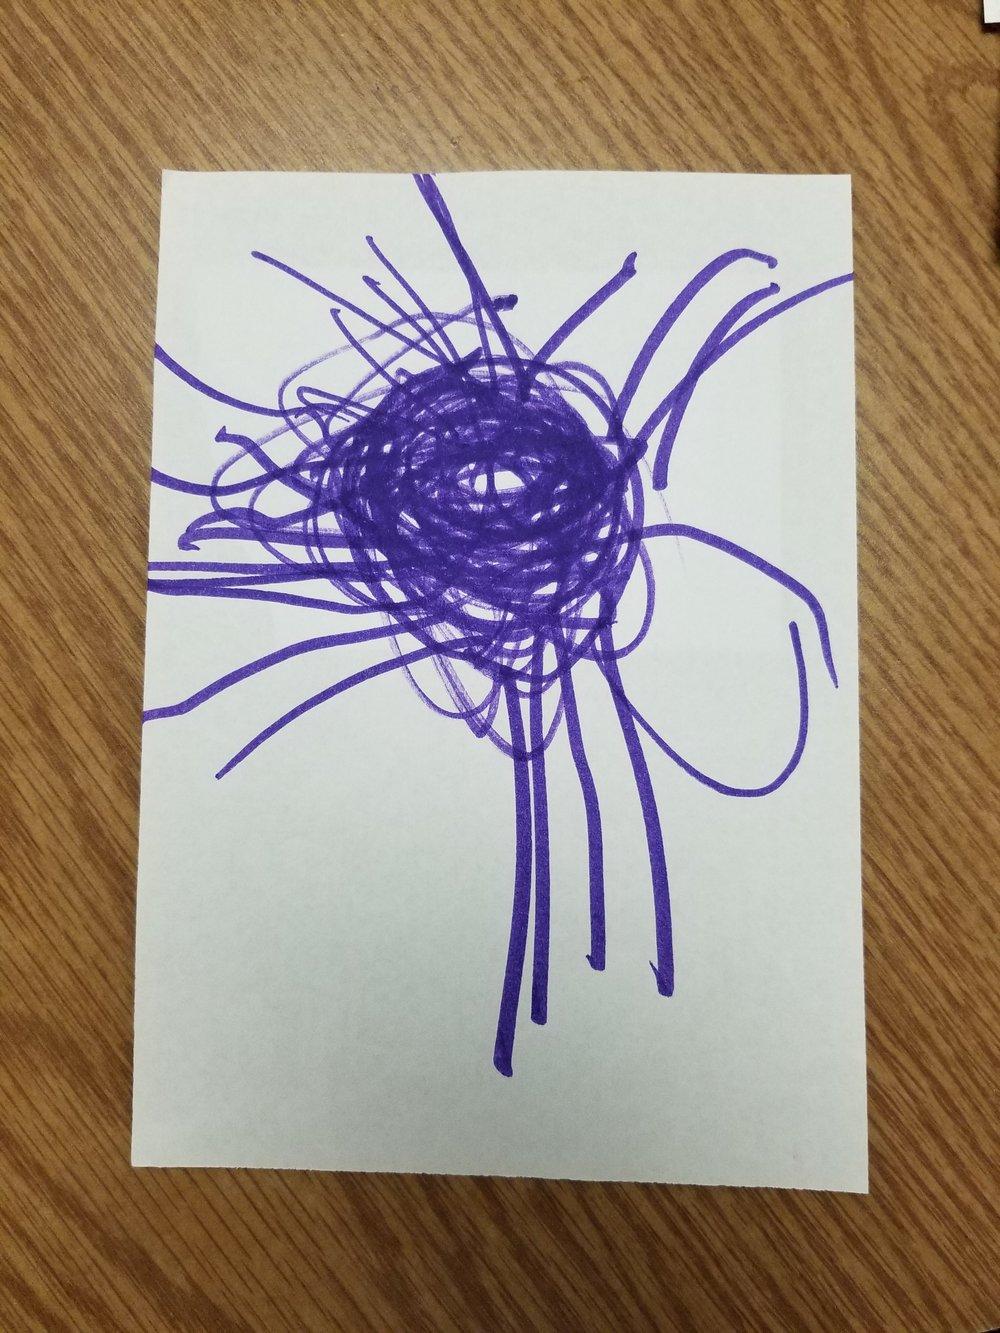 The Tiger Spider chosen by Jared Applegate